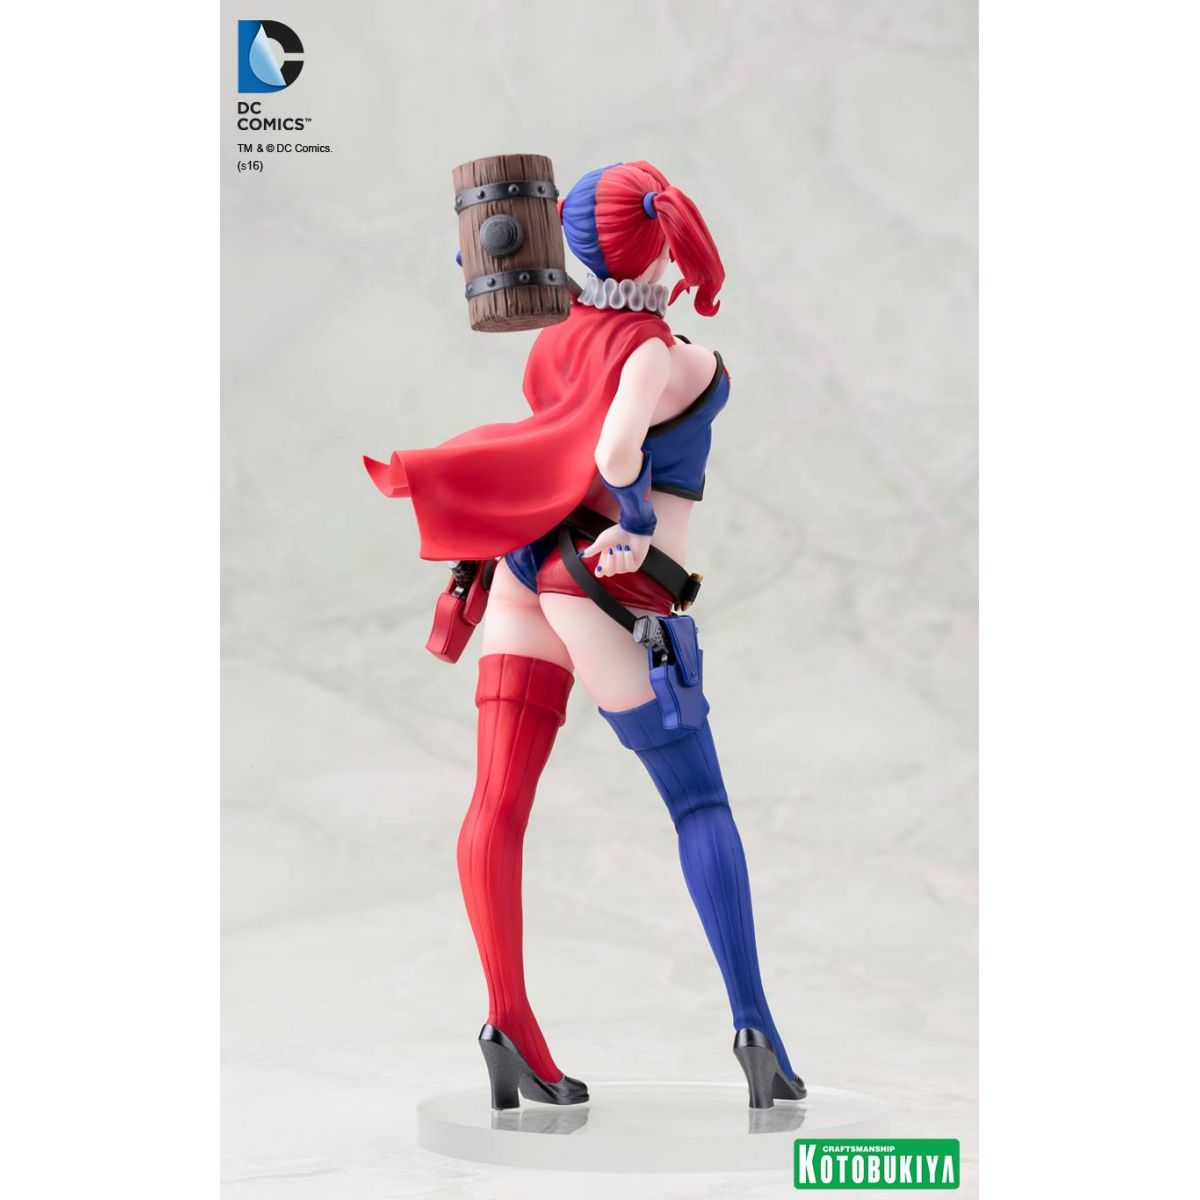 Dc Comics Bishoujo: Harley Quinn New 52 - Kotobukiya